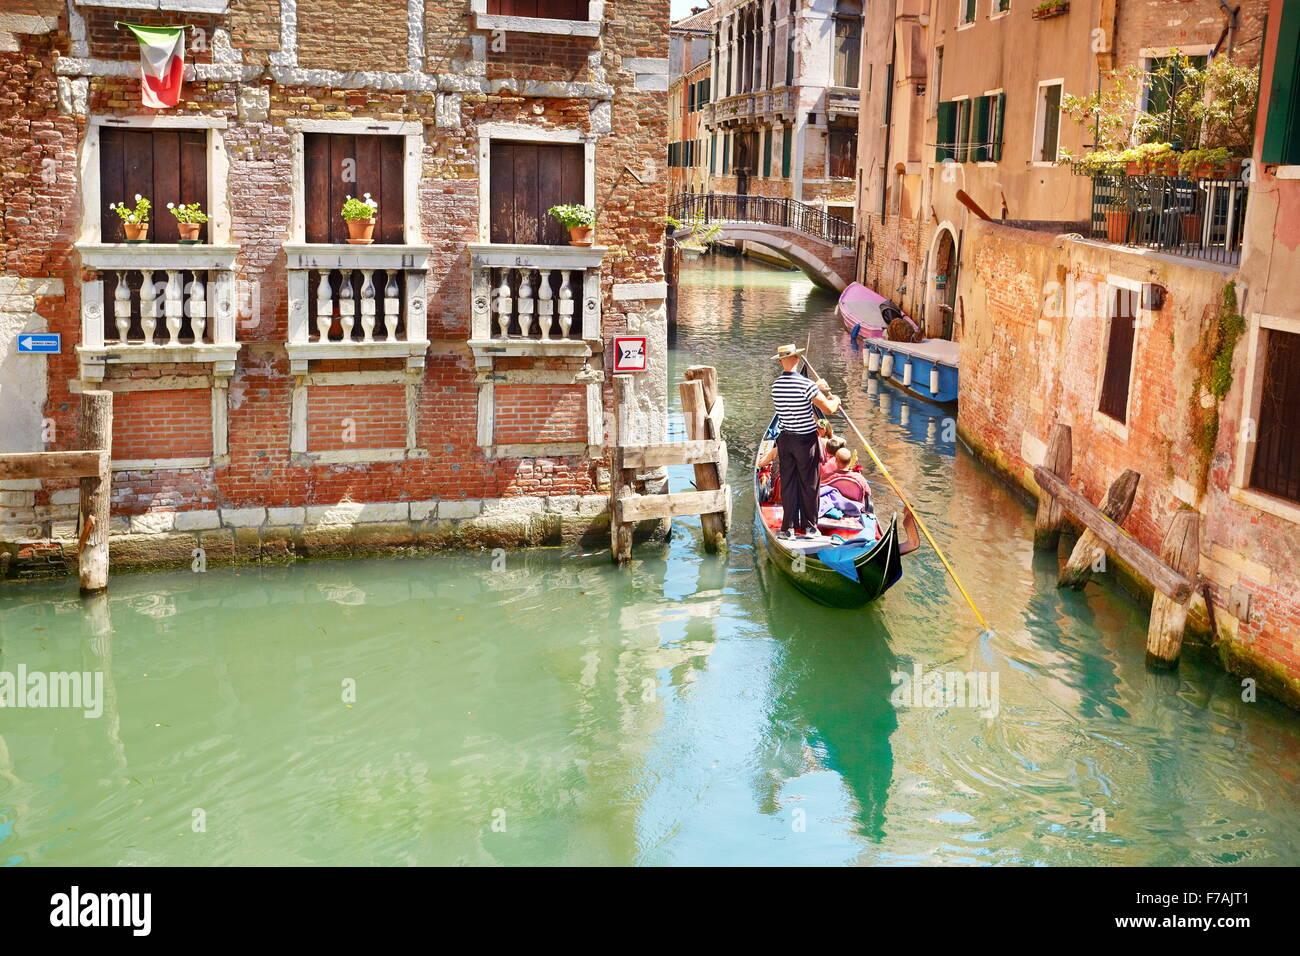 Tourists in gondola exploring venetian canal, Venice, Veneto, Italy, UNESCO - Stock Image